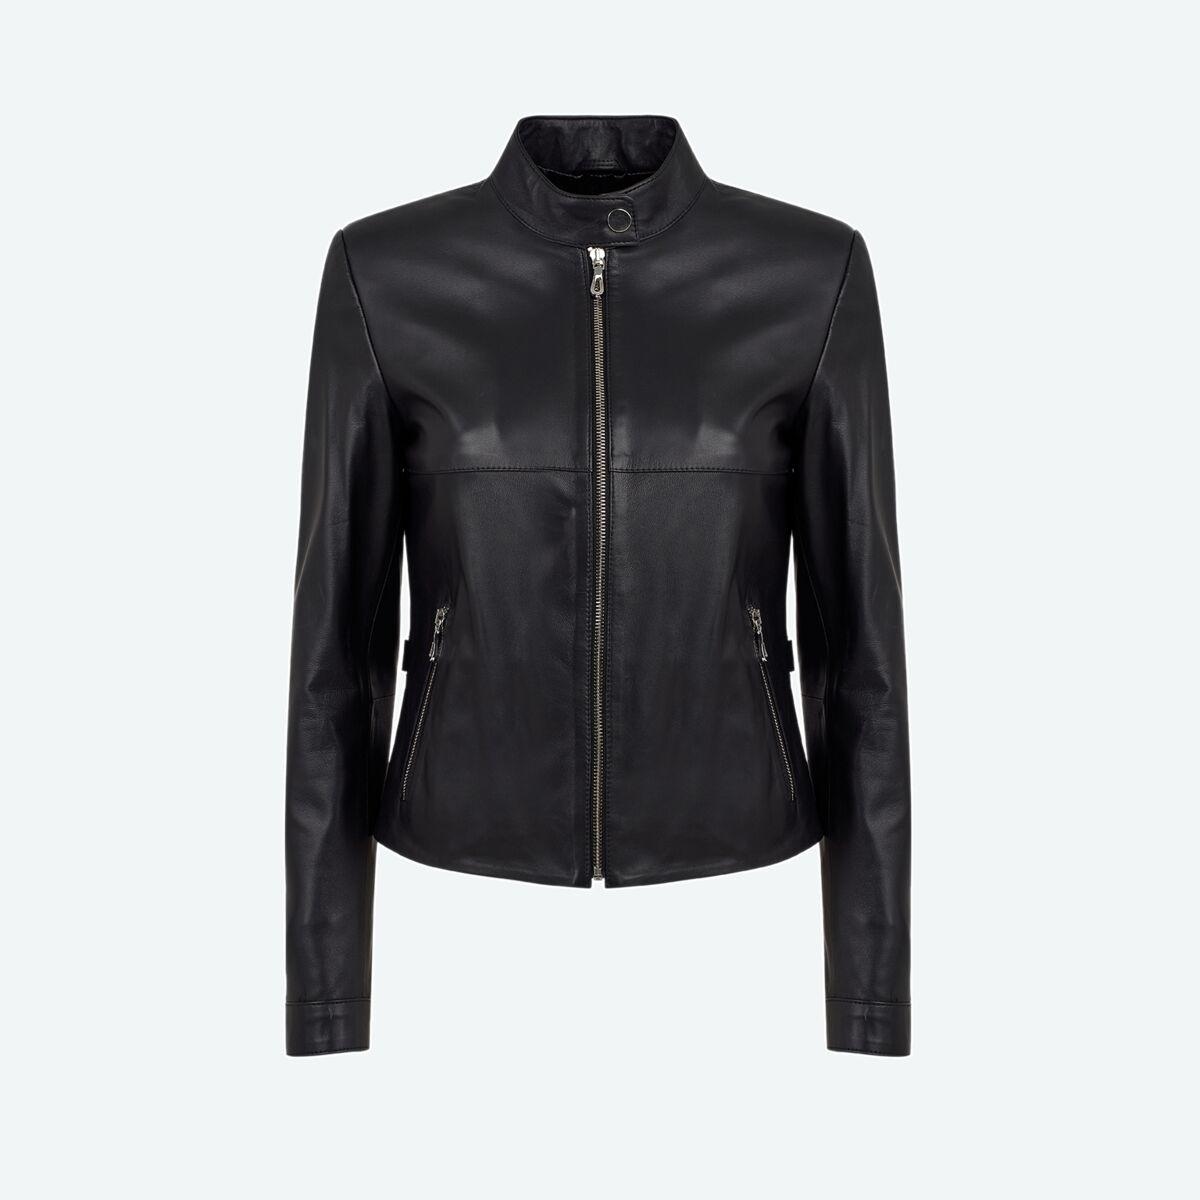 Women's Petite Leather Jacket - Black